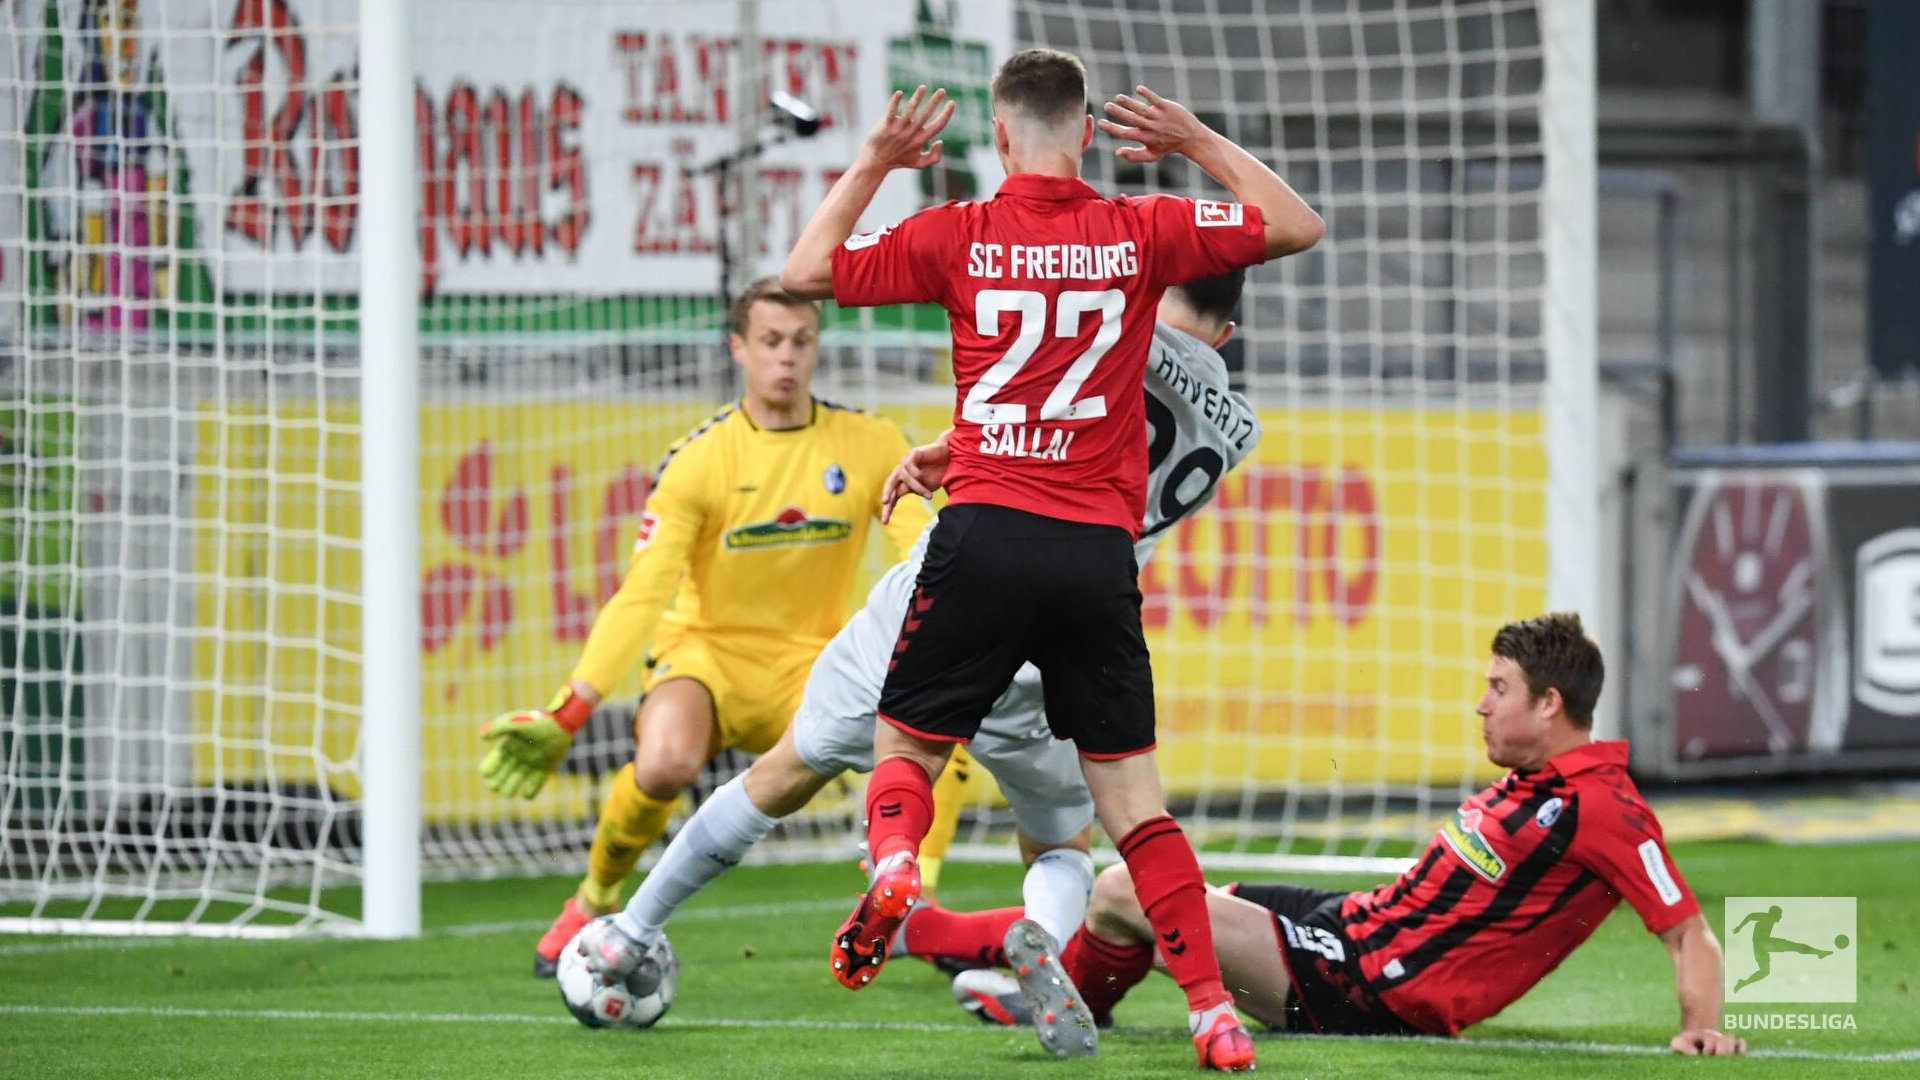 Bundesliga: Leverkusen Beat Freiburg Away; Strengthen Title Push